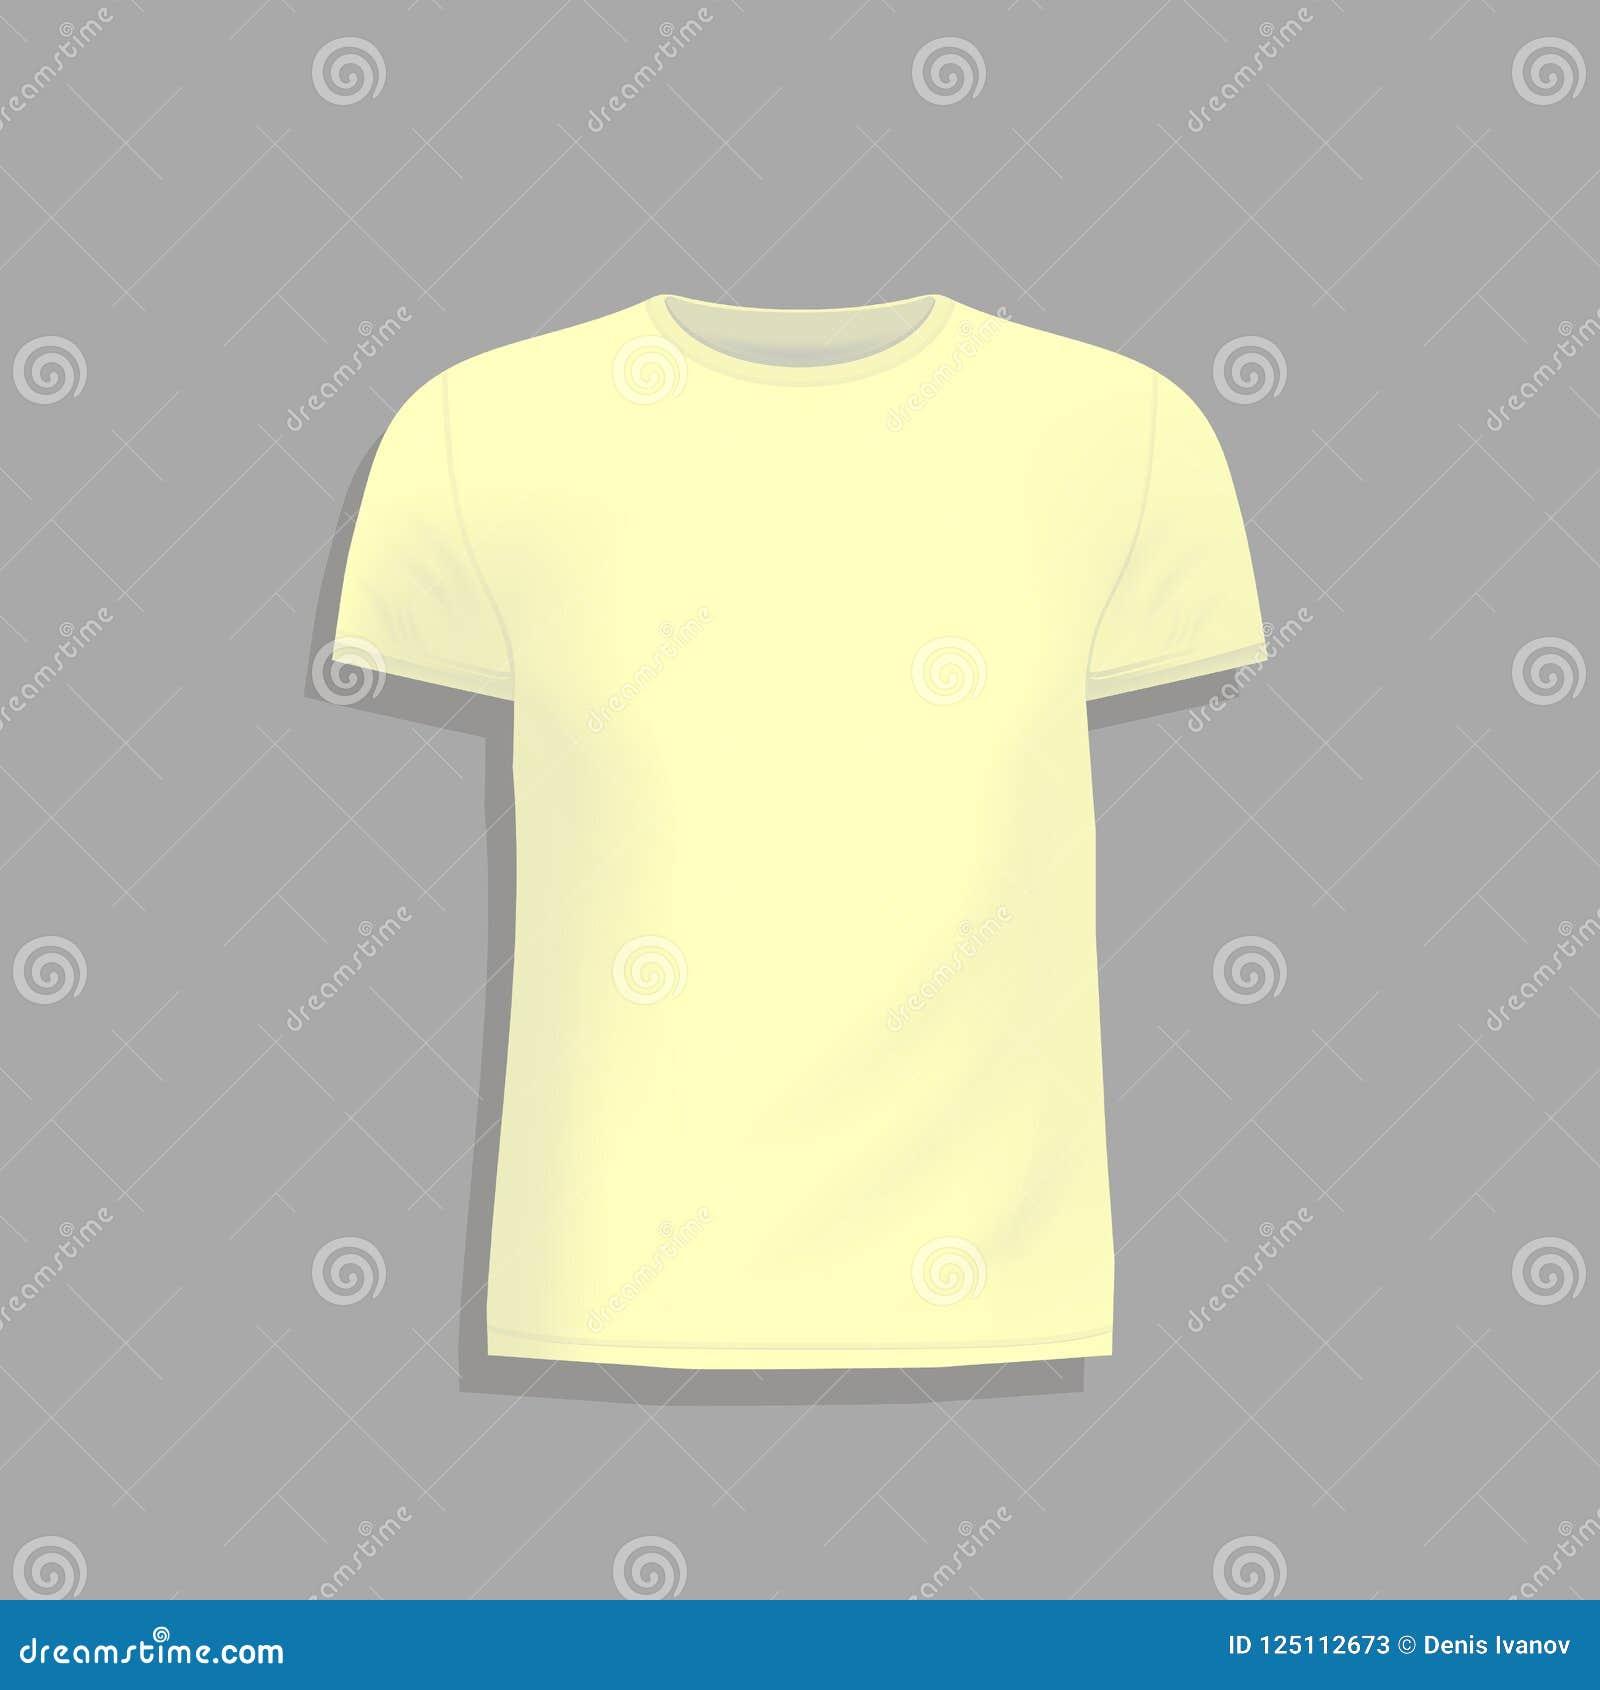 Mens Yellow T Shirt Design Template Mock Up Tshirt For Print Blank White